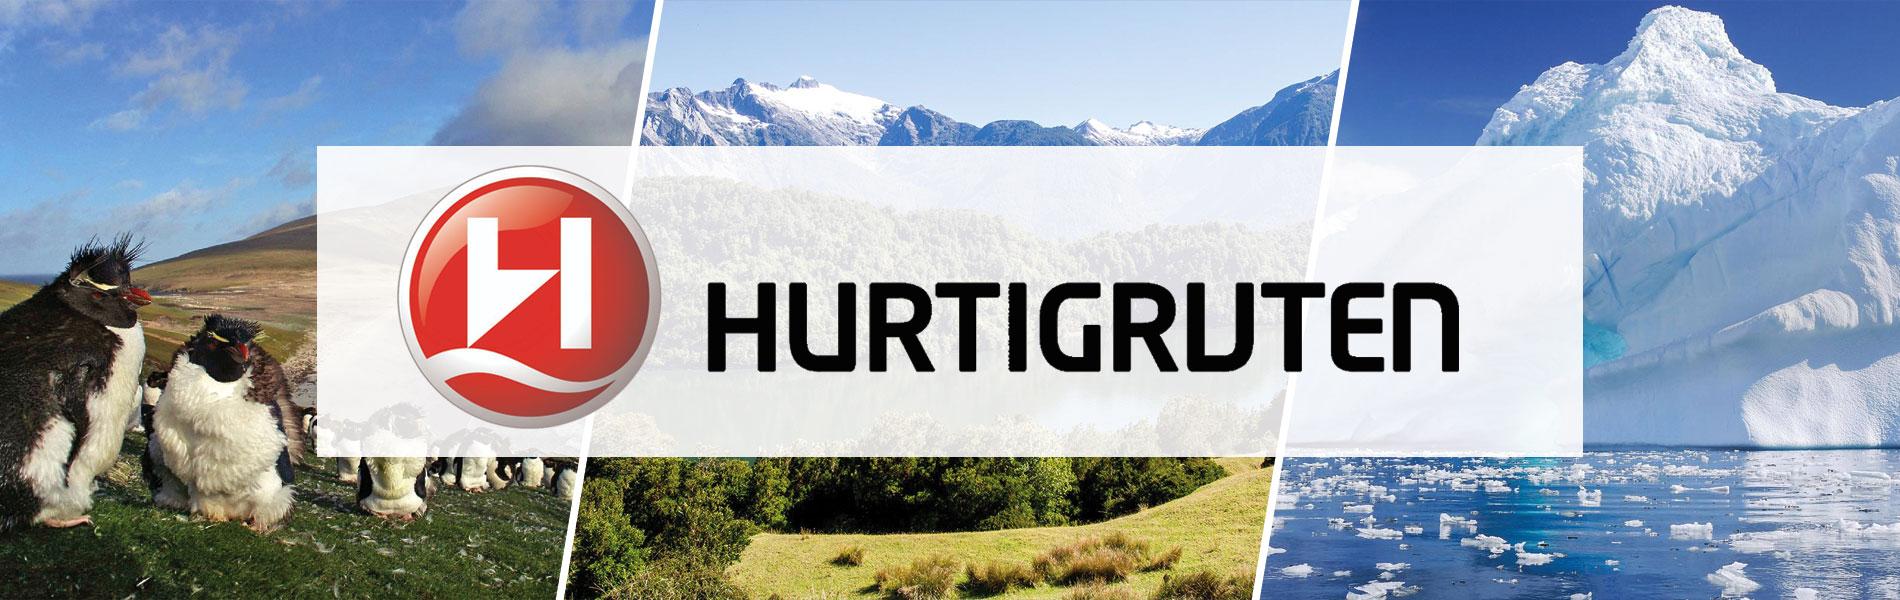 Hurtigruten-page-banner